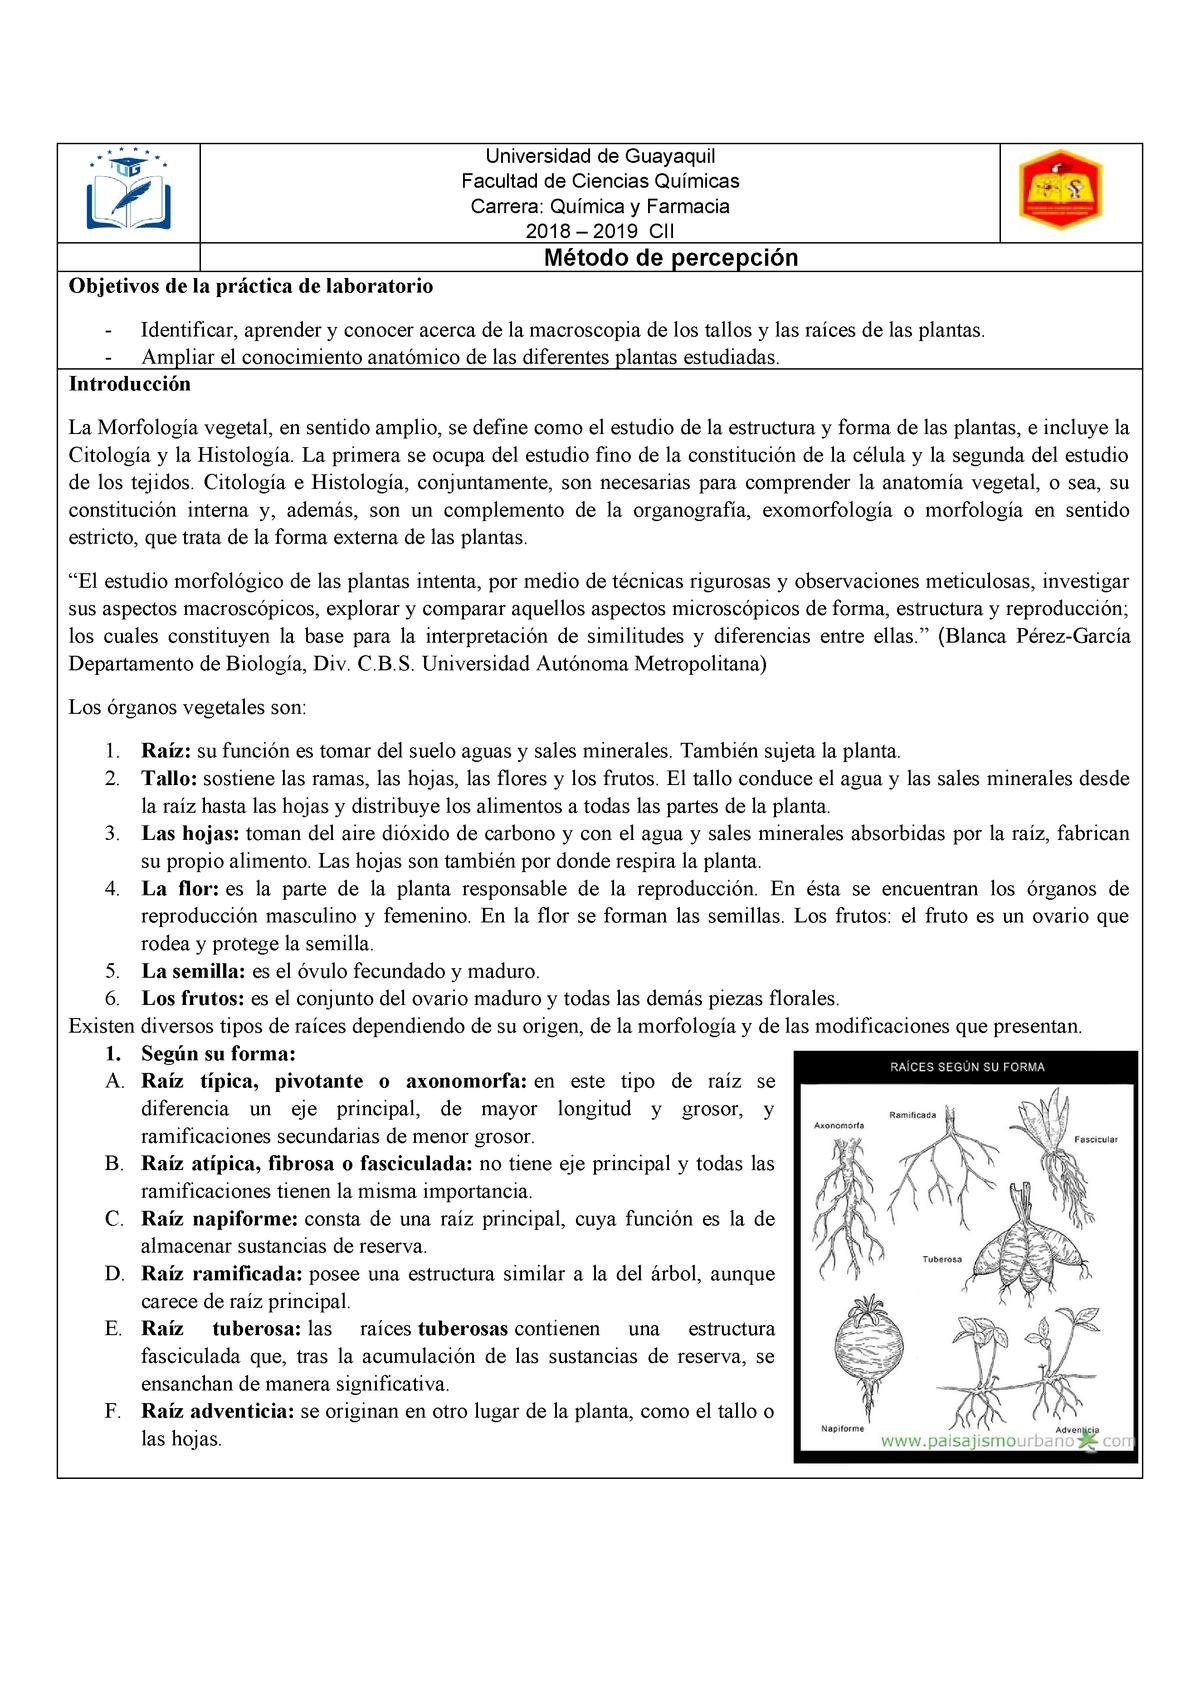 Informe Raiz Y Tallos Botanica Sistematica I Ug Studocu